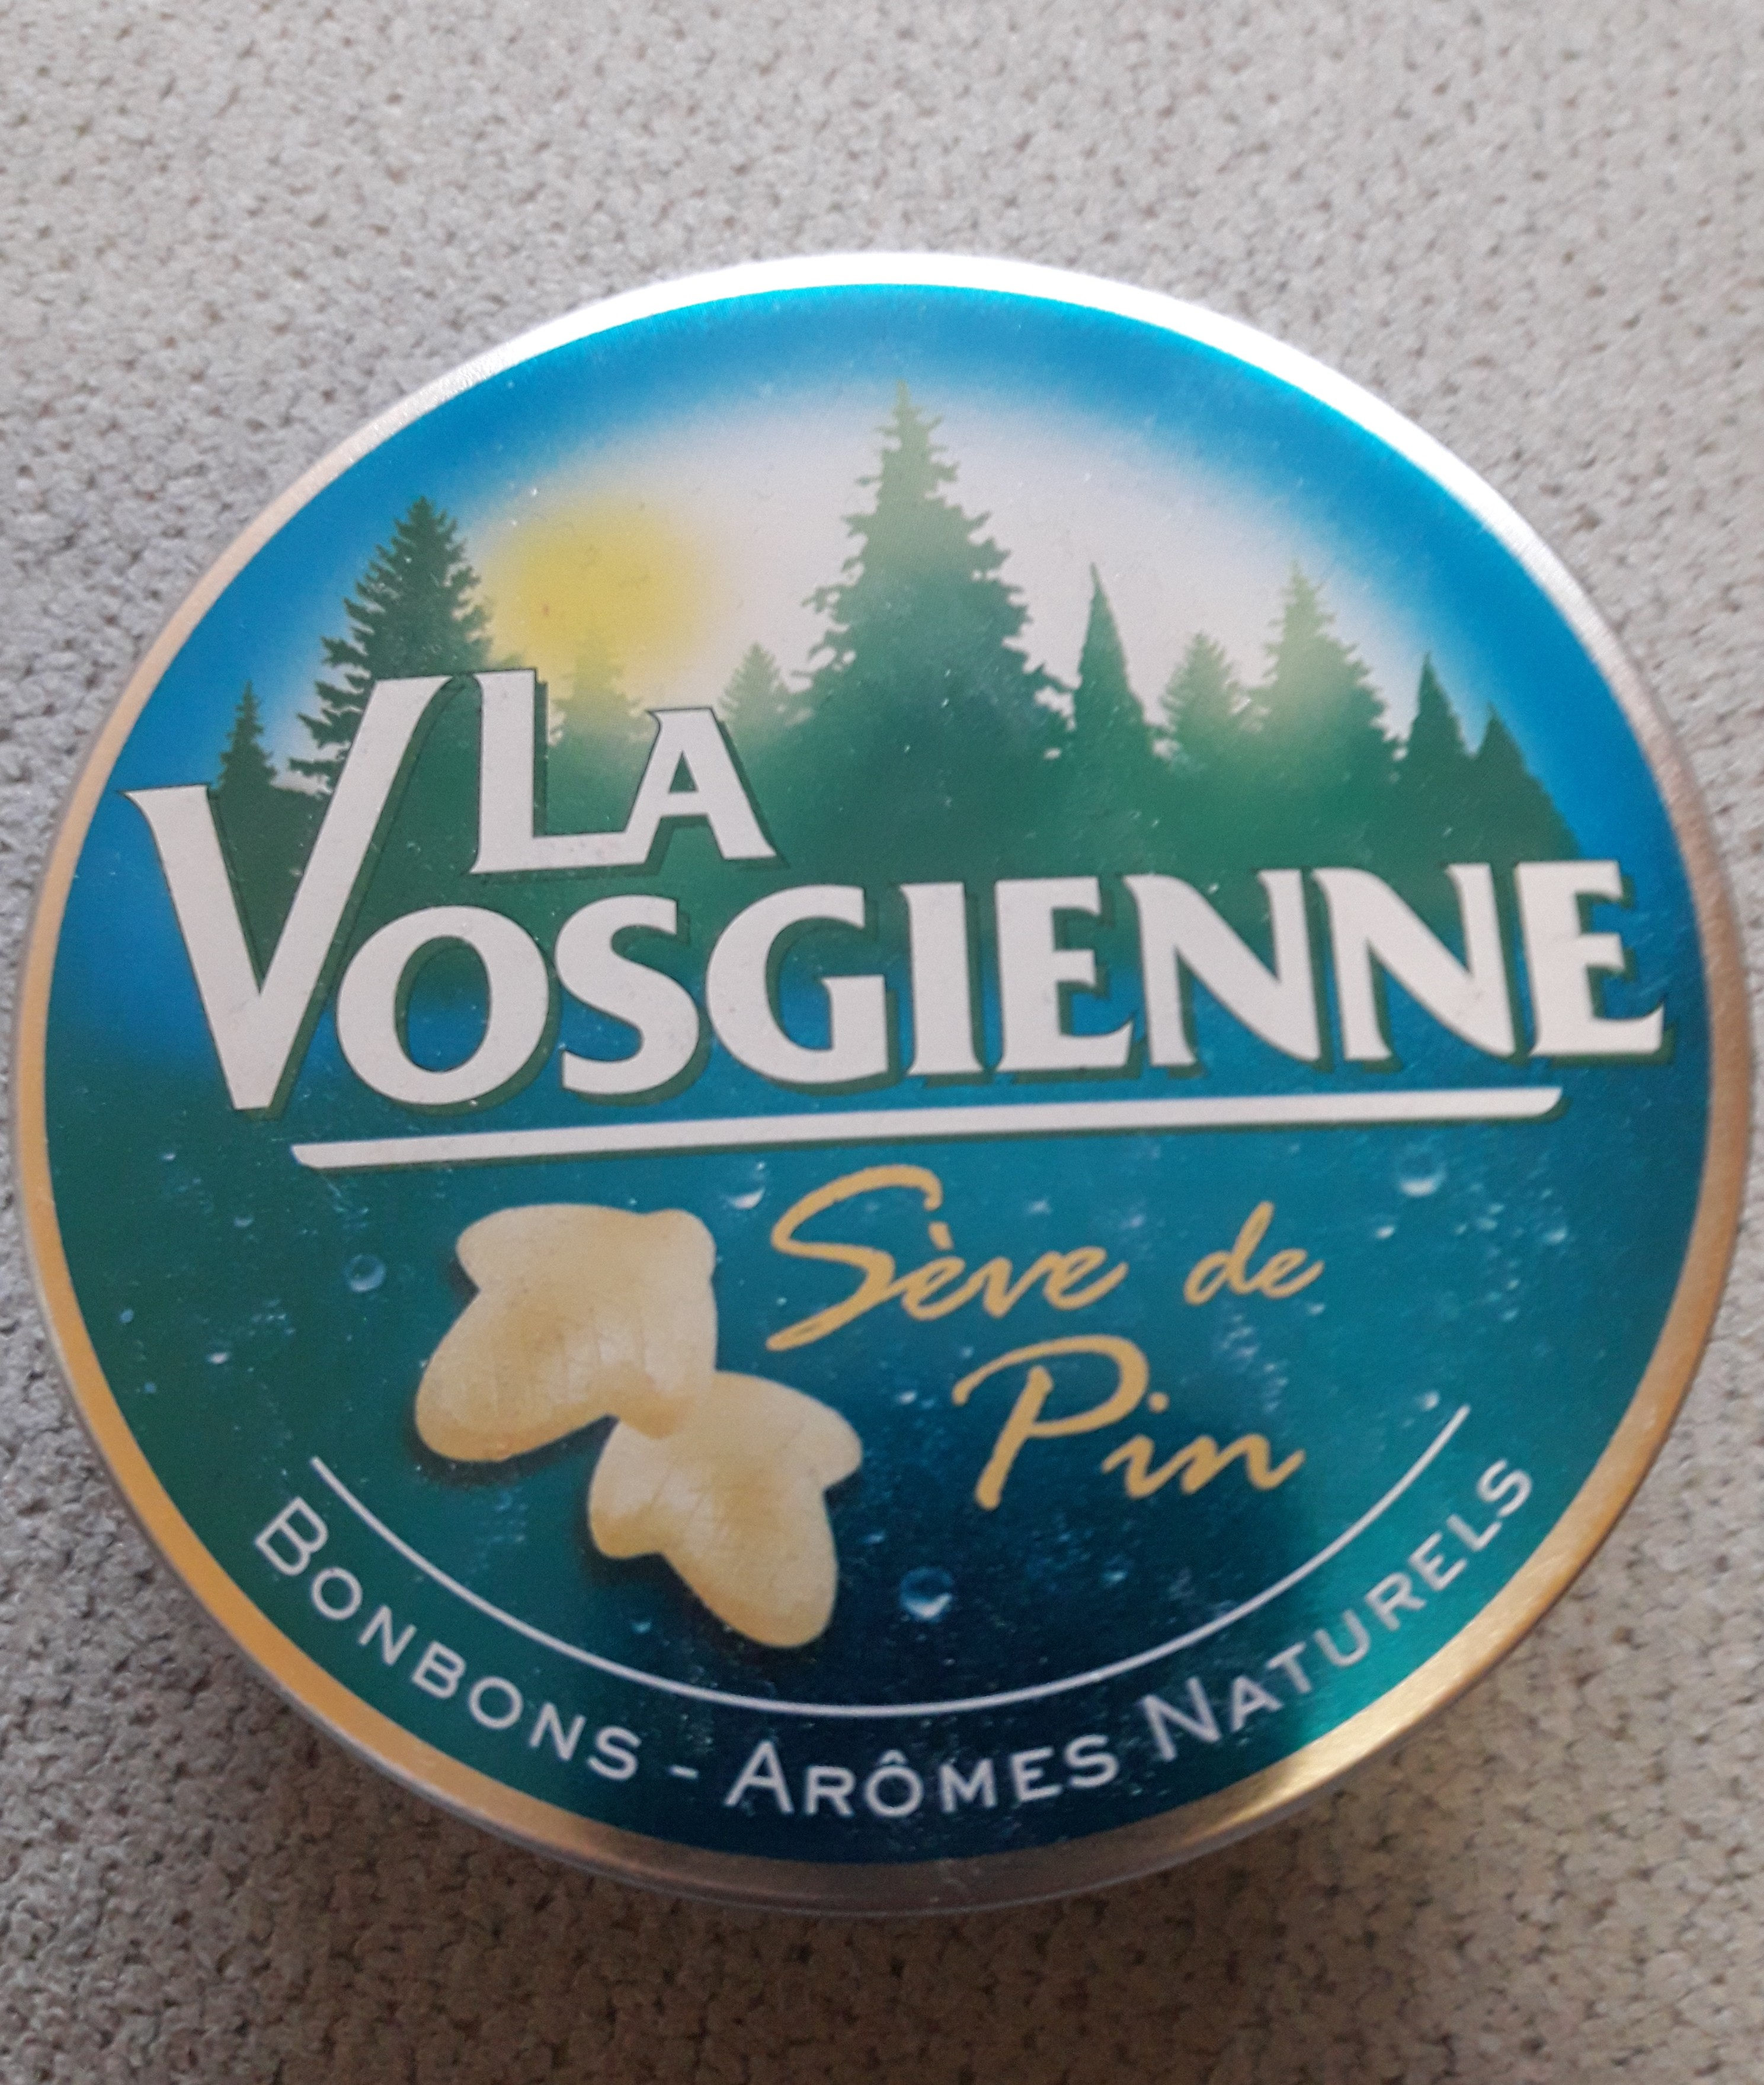 Bonbons à la menthe - Produto - fr